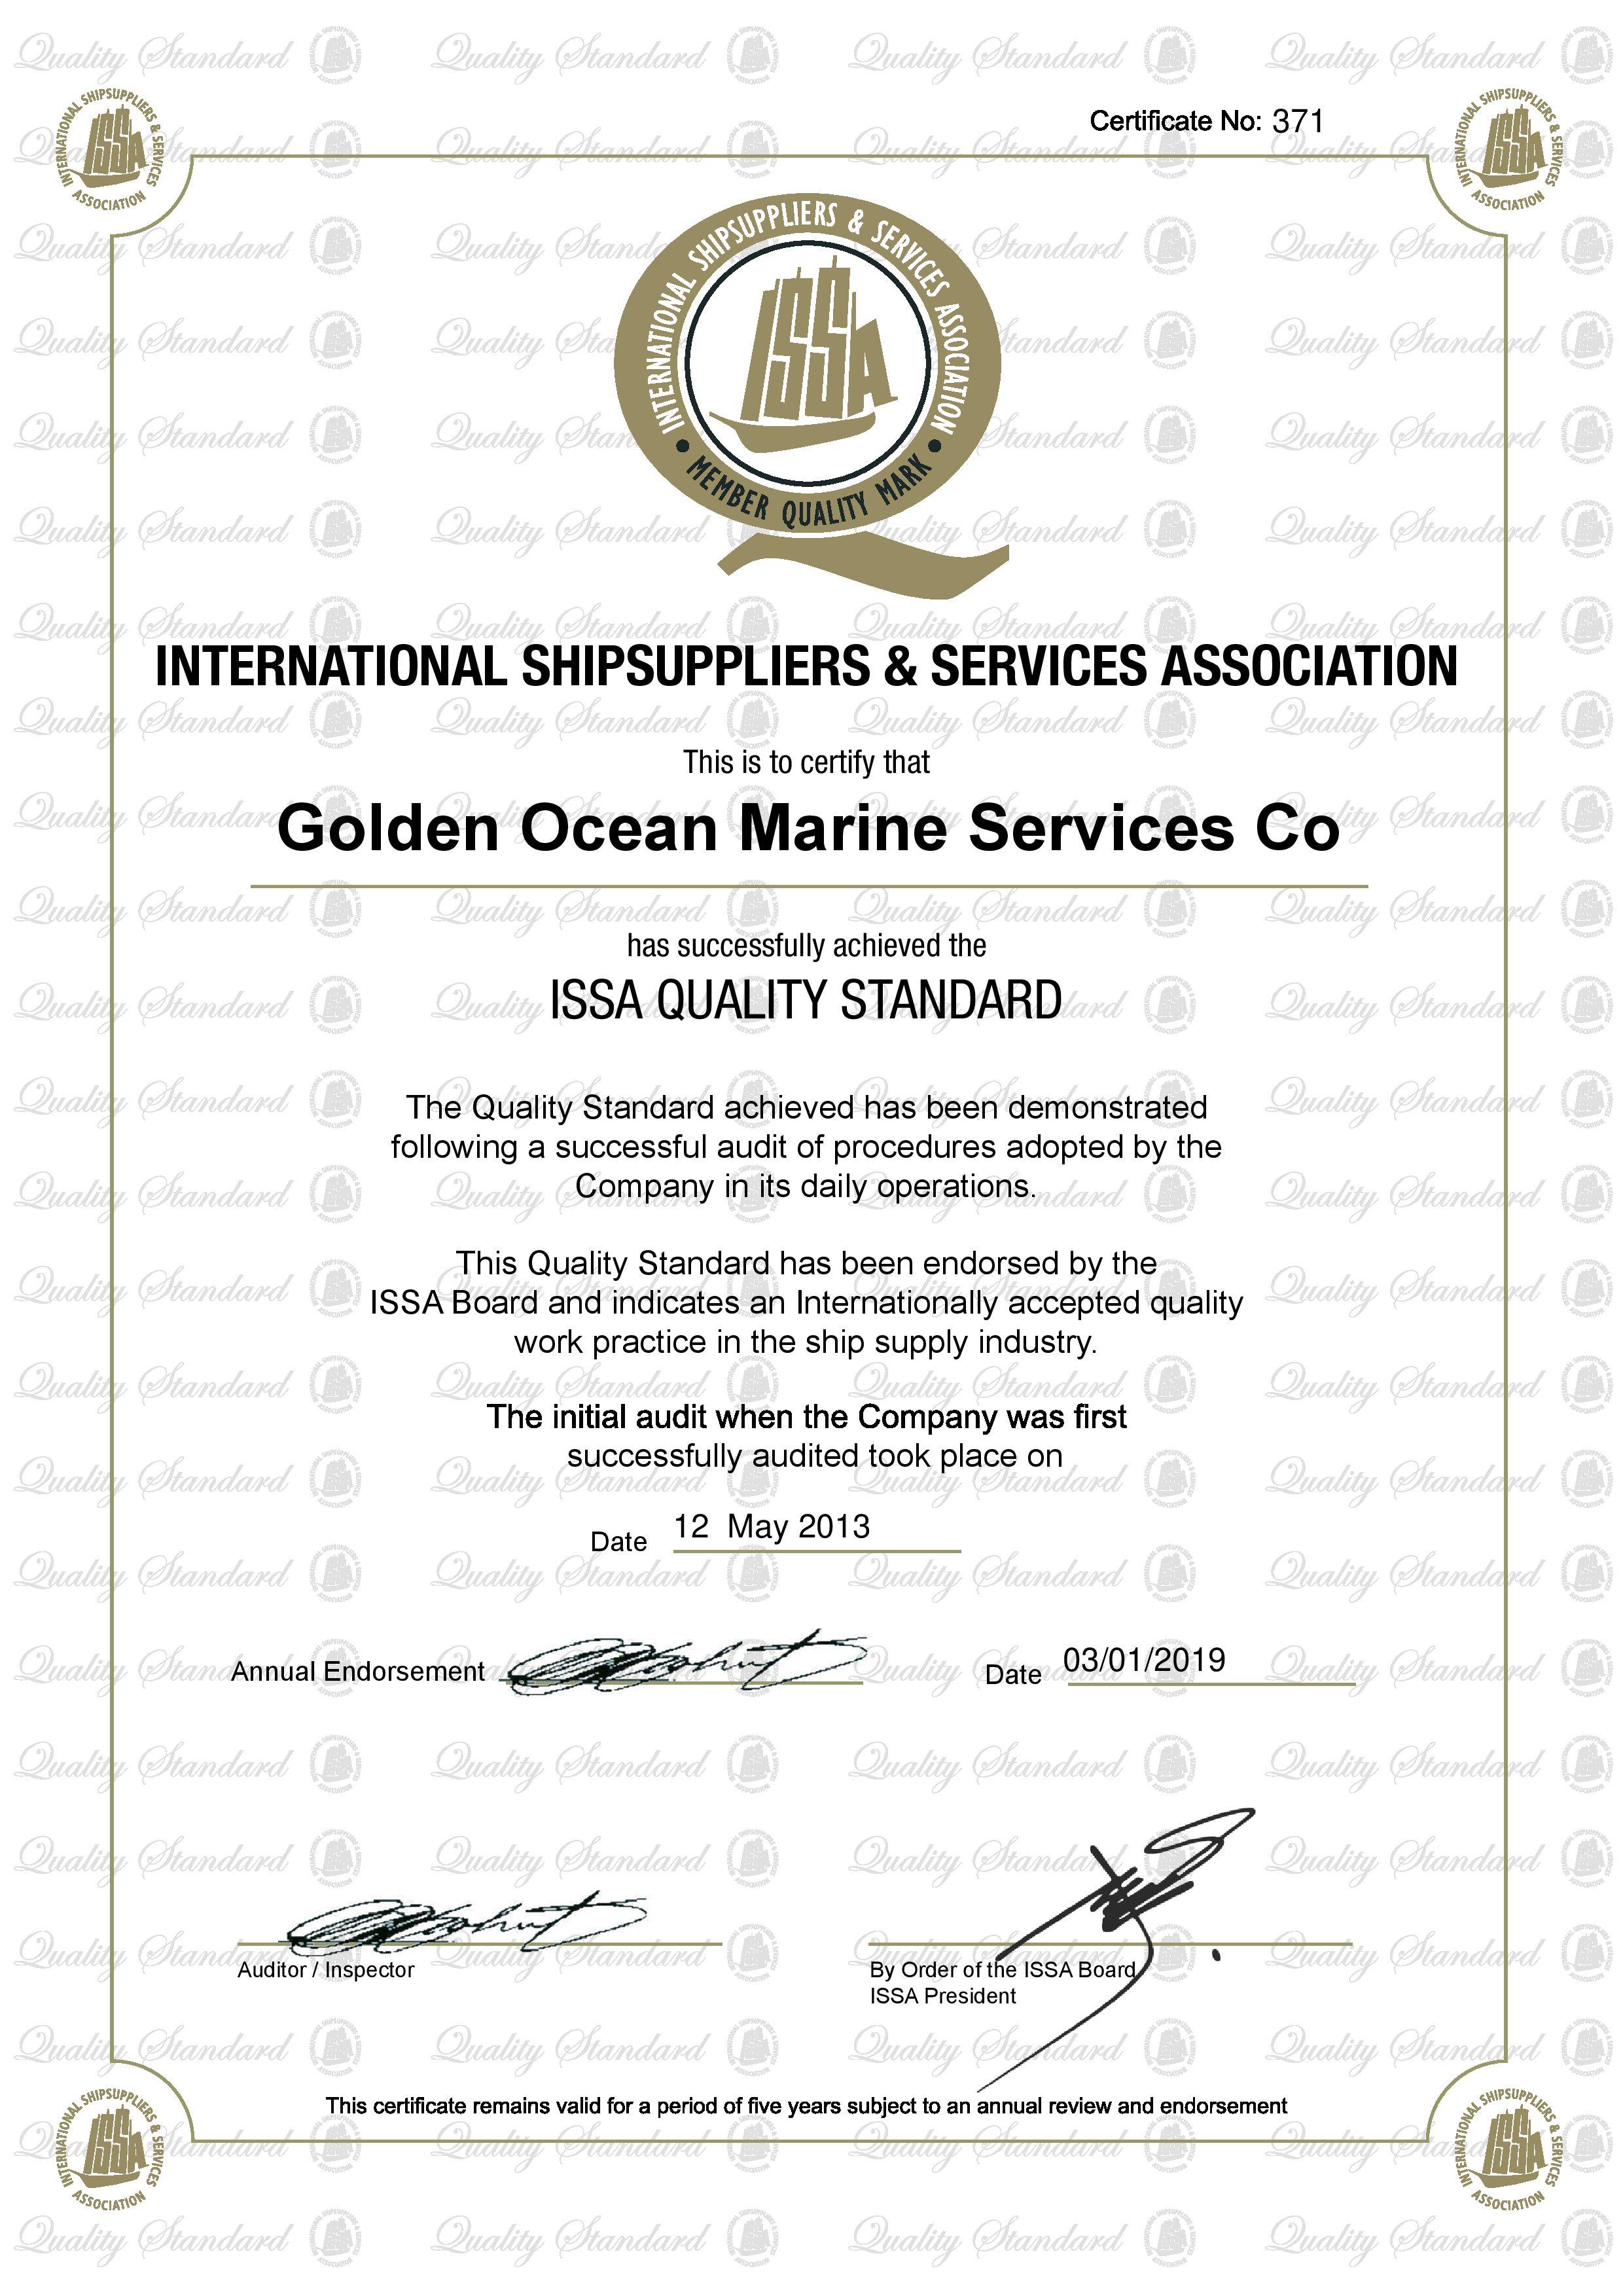 issa certificate maritime international certificates marine nbs association accreditations